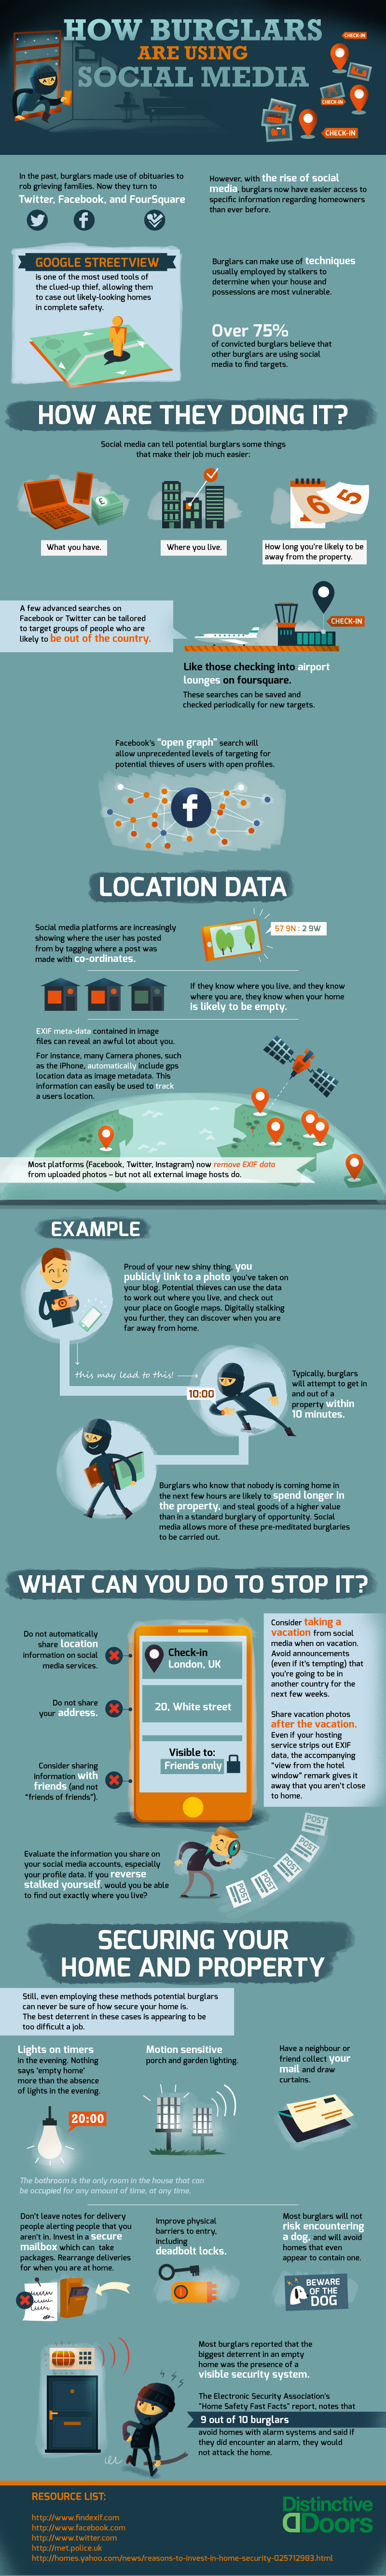 how-burglars-are-using-social-media_51c812286edf5.png-1